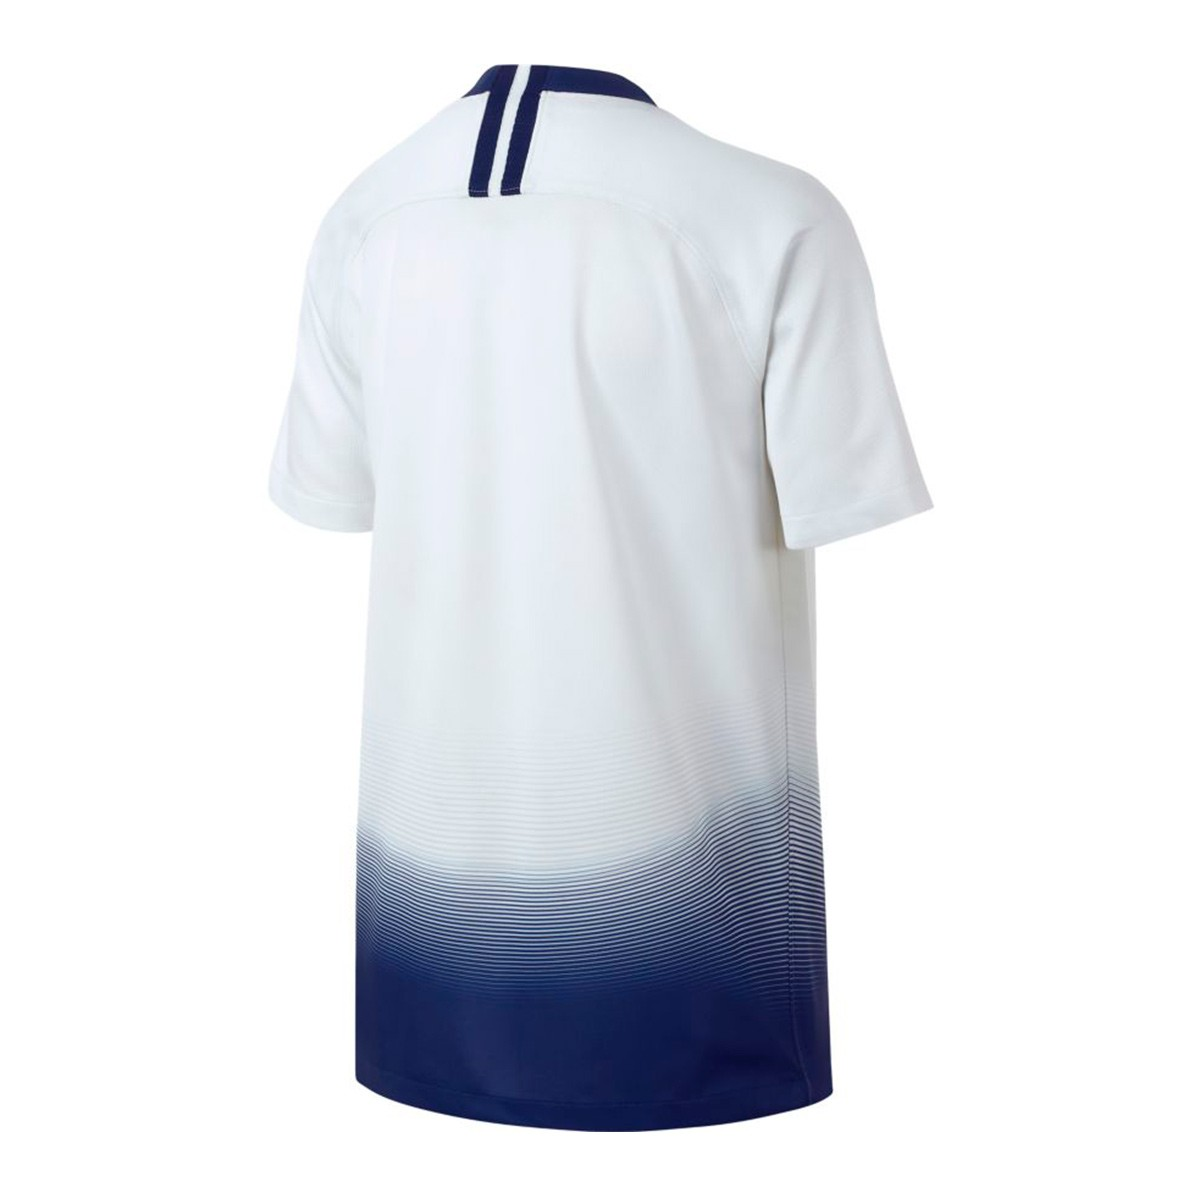 763c9321 Jersey Nike Kids Tottenham Hotspur FC Stadium 2018-2019 Home White ...